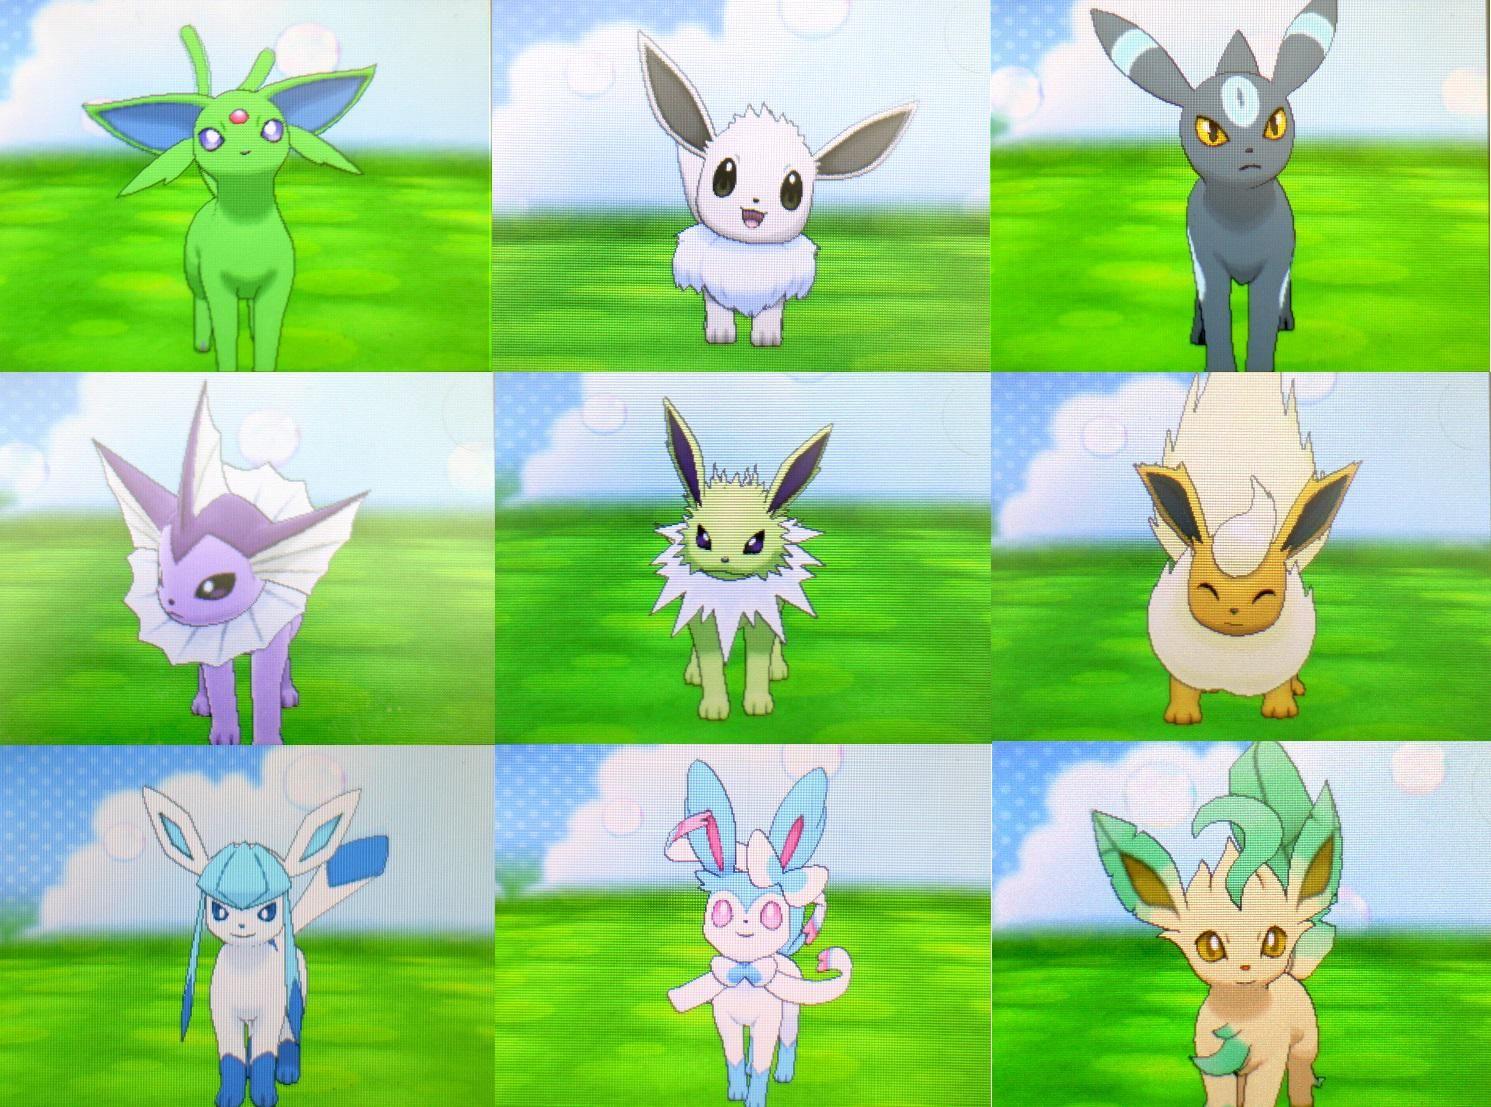 Shiny eevee evolutions | Shiny eevee evolutions, Pokemon ...